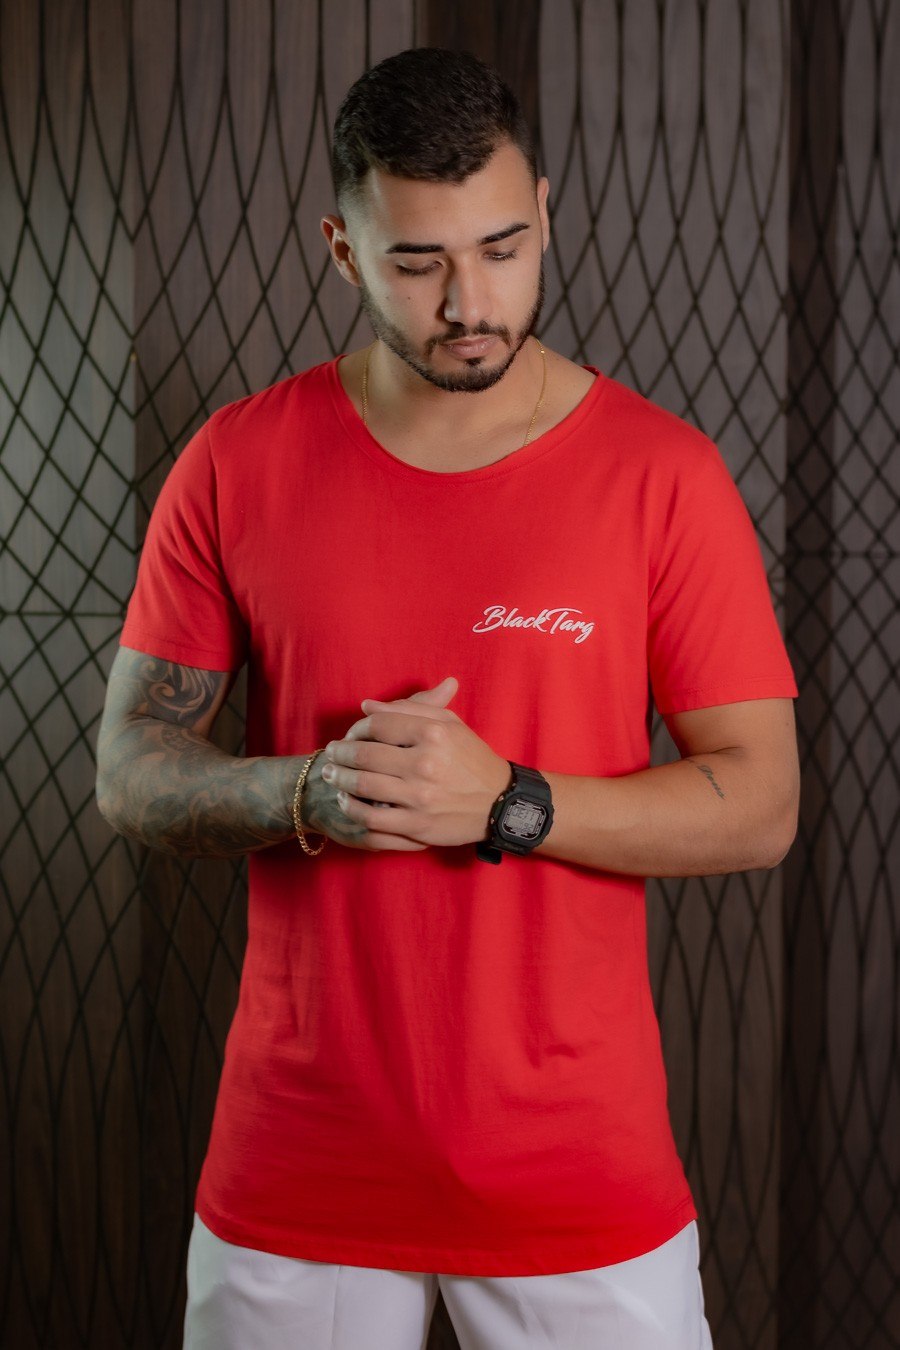 Camiseta Longline Masculina vermelha basic